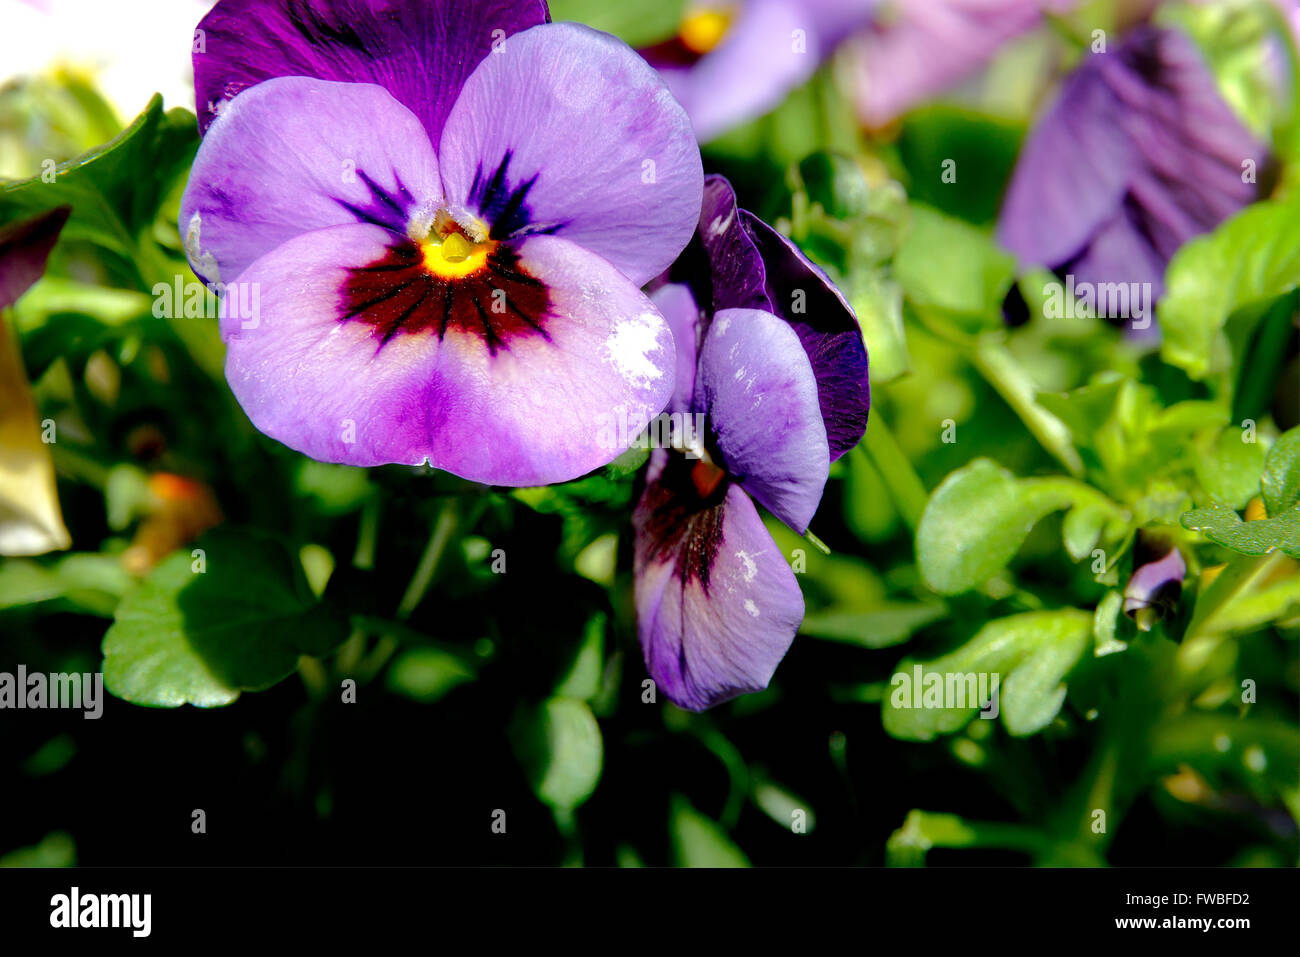 Botanic gardening plant : macro shot of purple viola cornuta (horned pansy or horned violet) - Stock Image